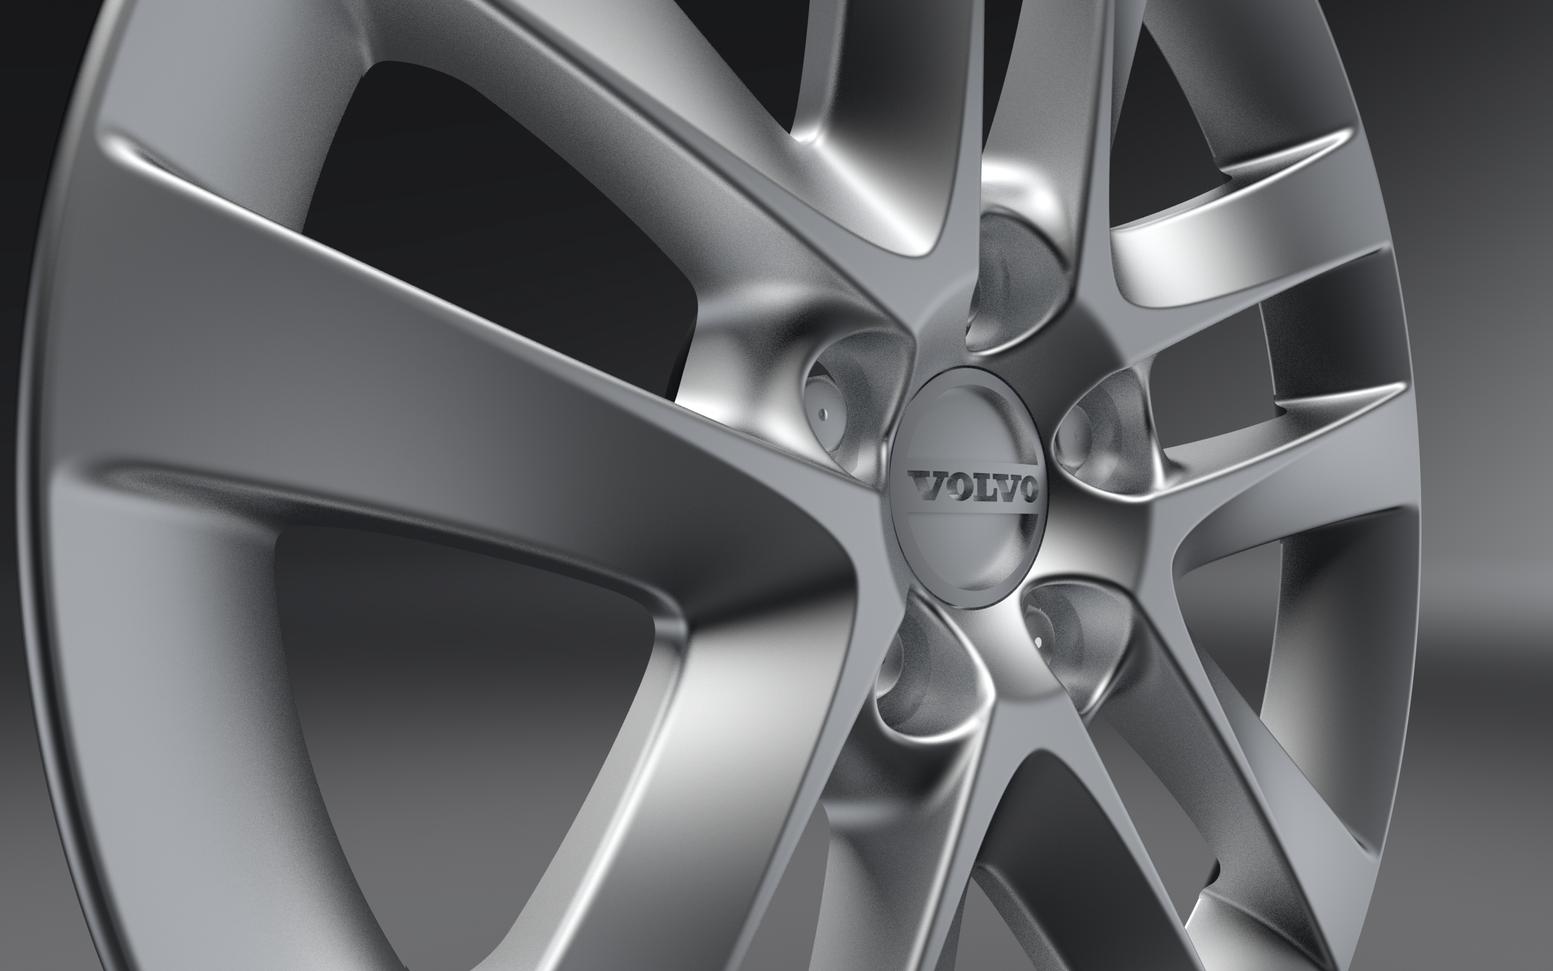 Volvo-Rim-Closeup.N1A.png